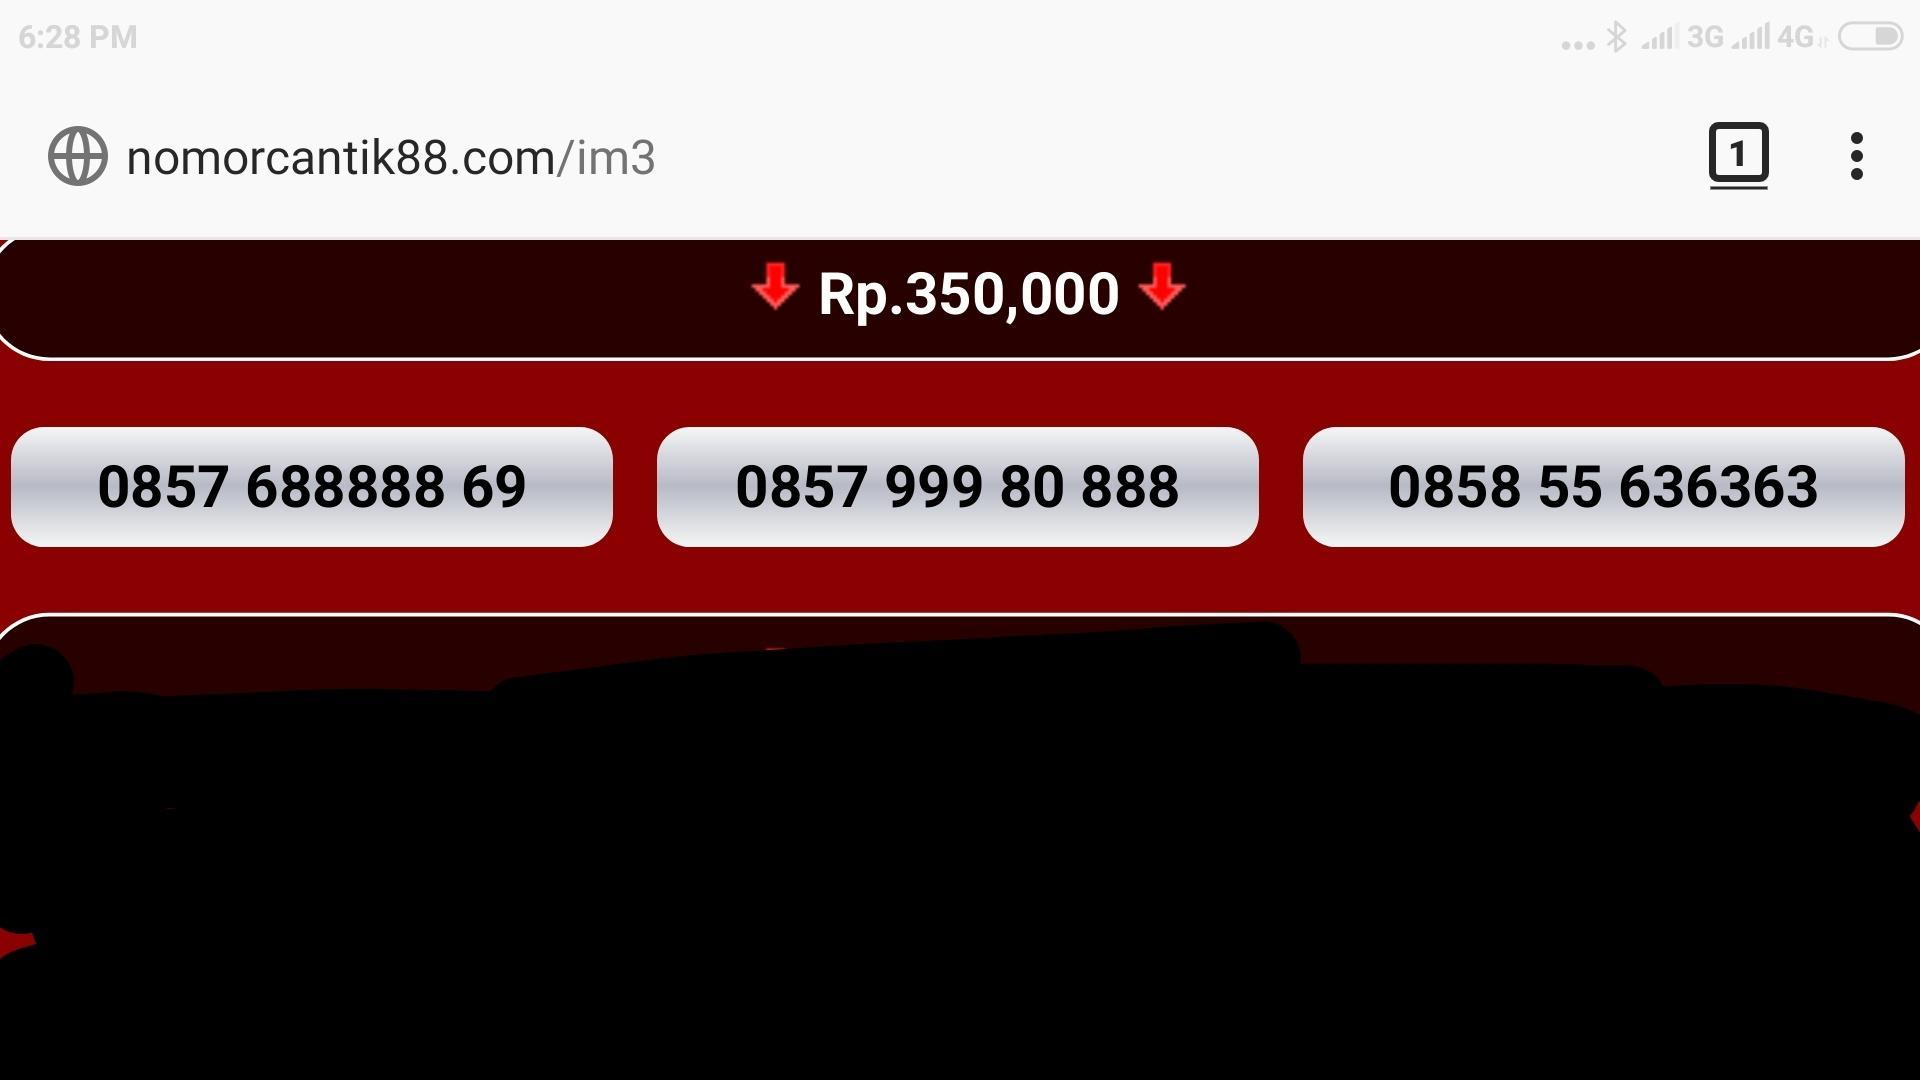 Nomor cantik im3 kartu perdana indosat nocan gsm 10 digit 3G 4G 0816 mentari prabayar super